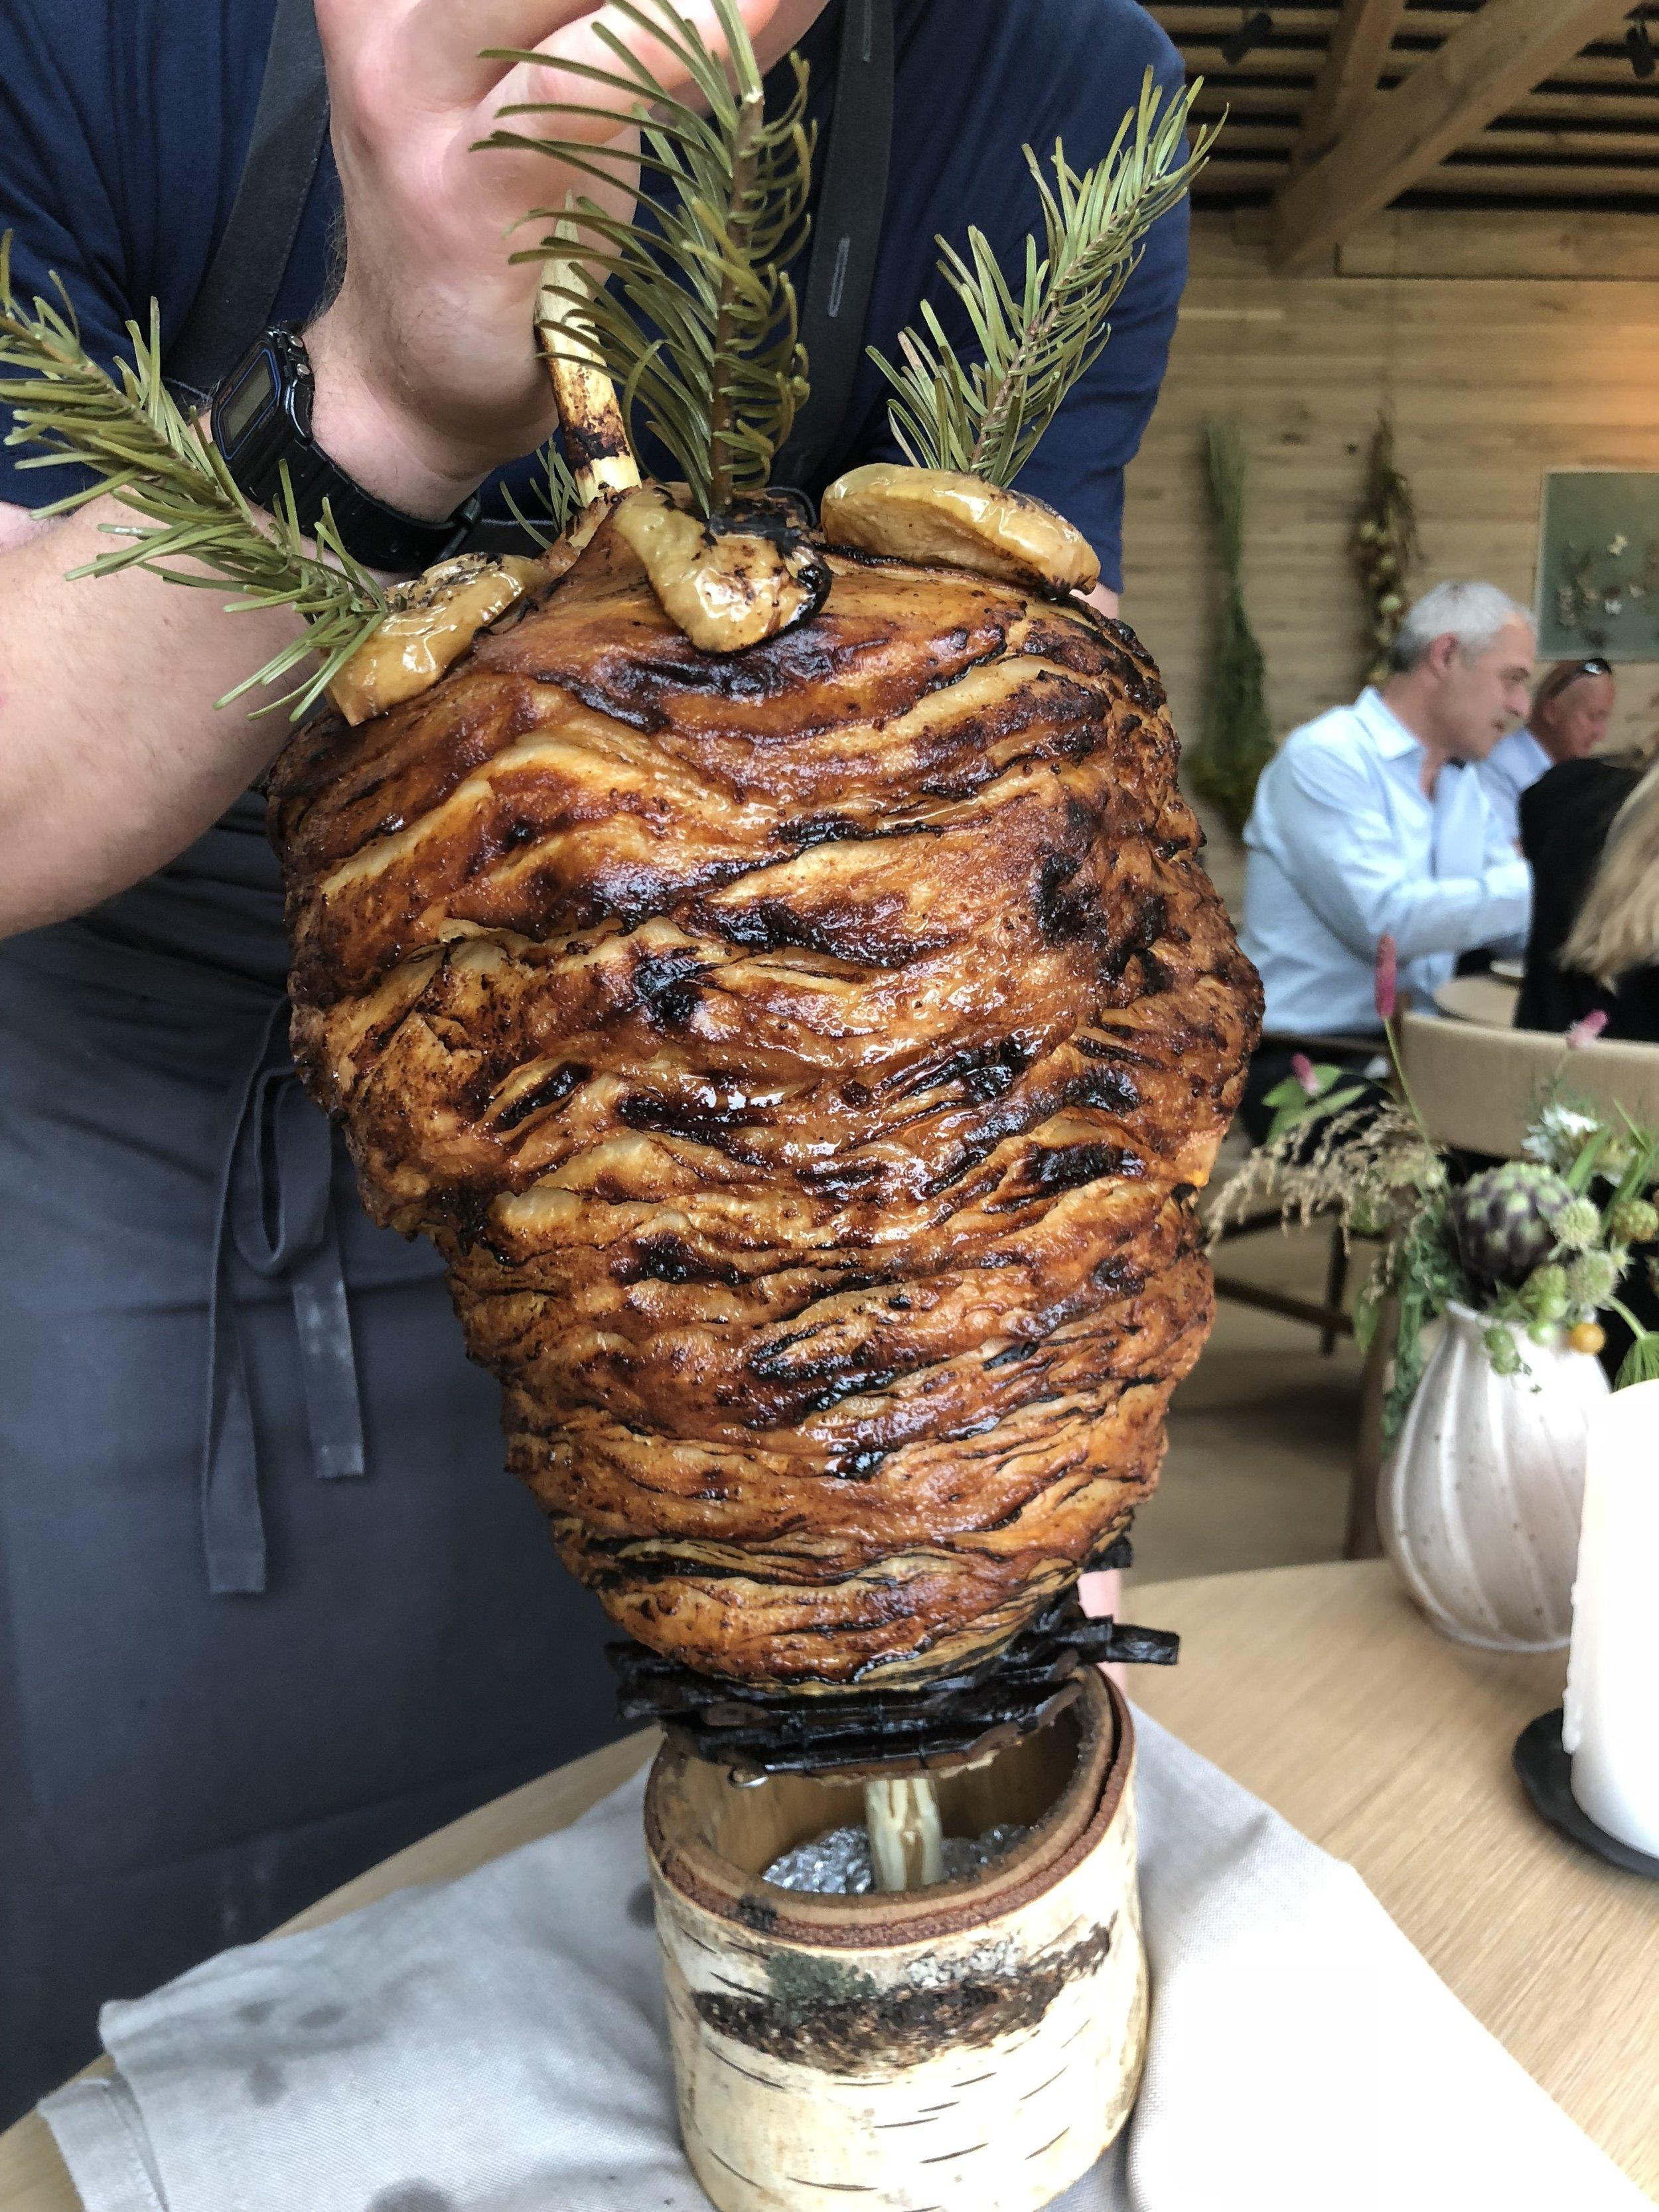 Celeraic shawarma